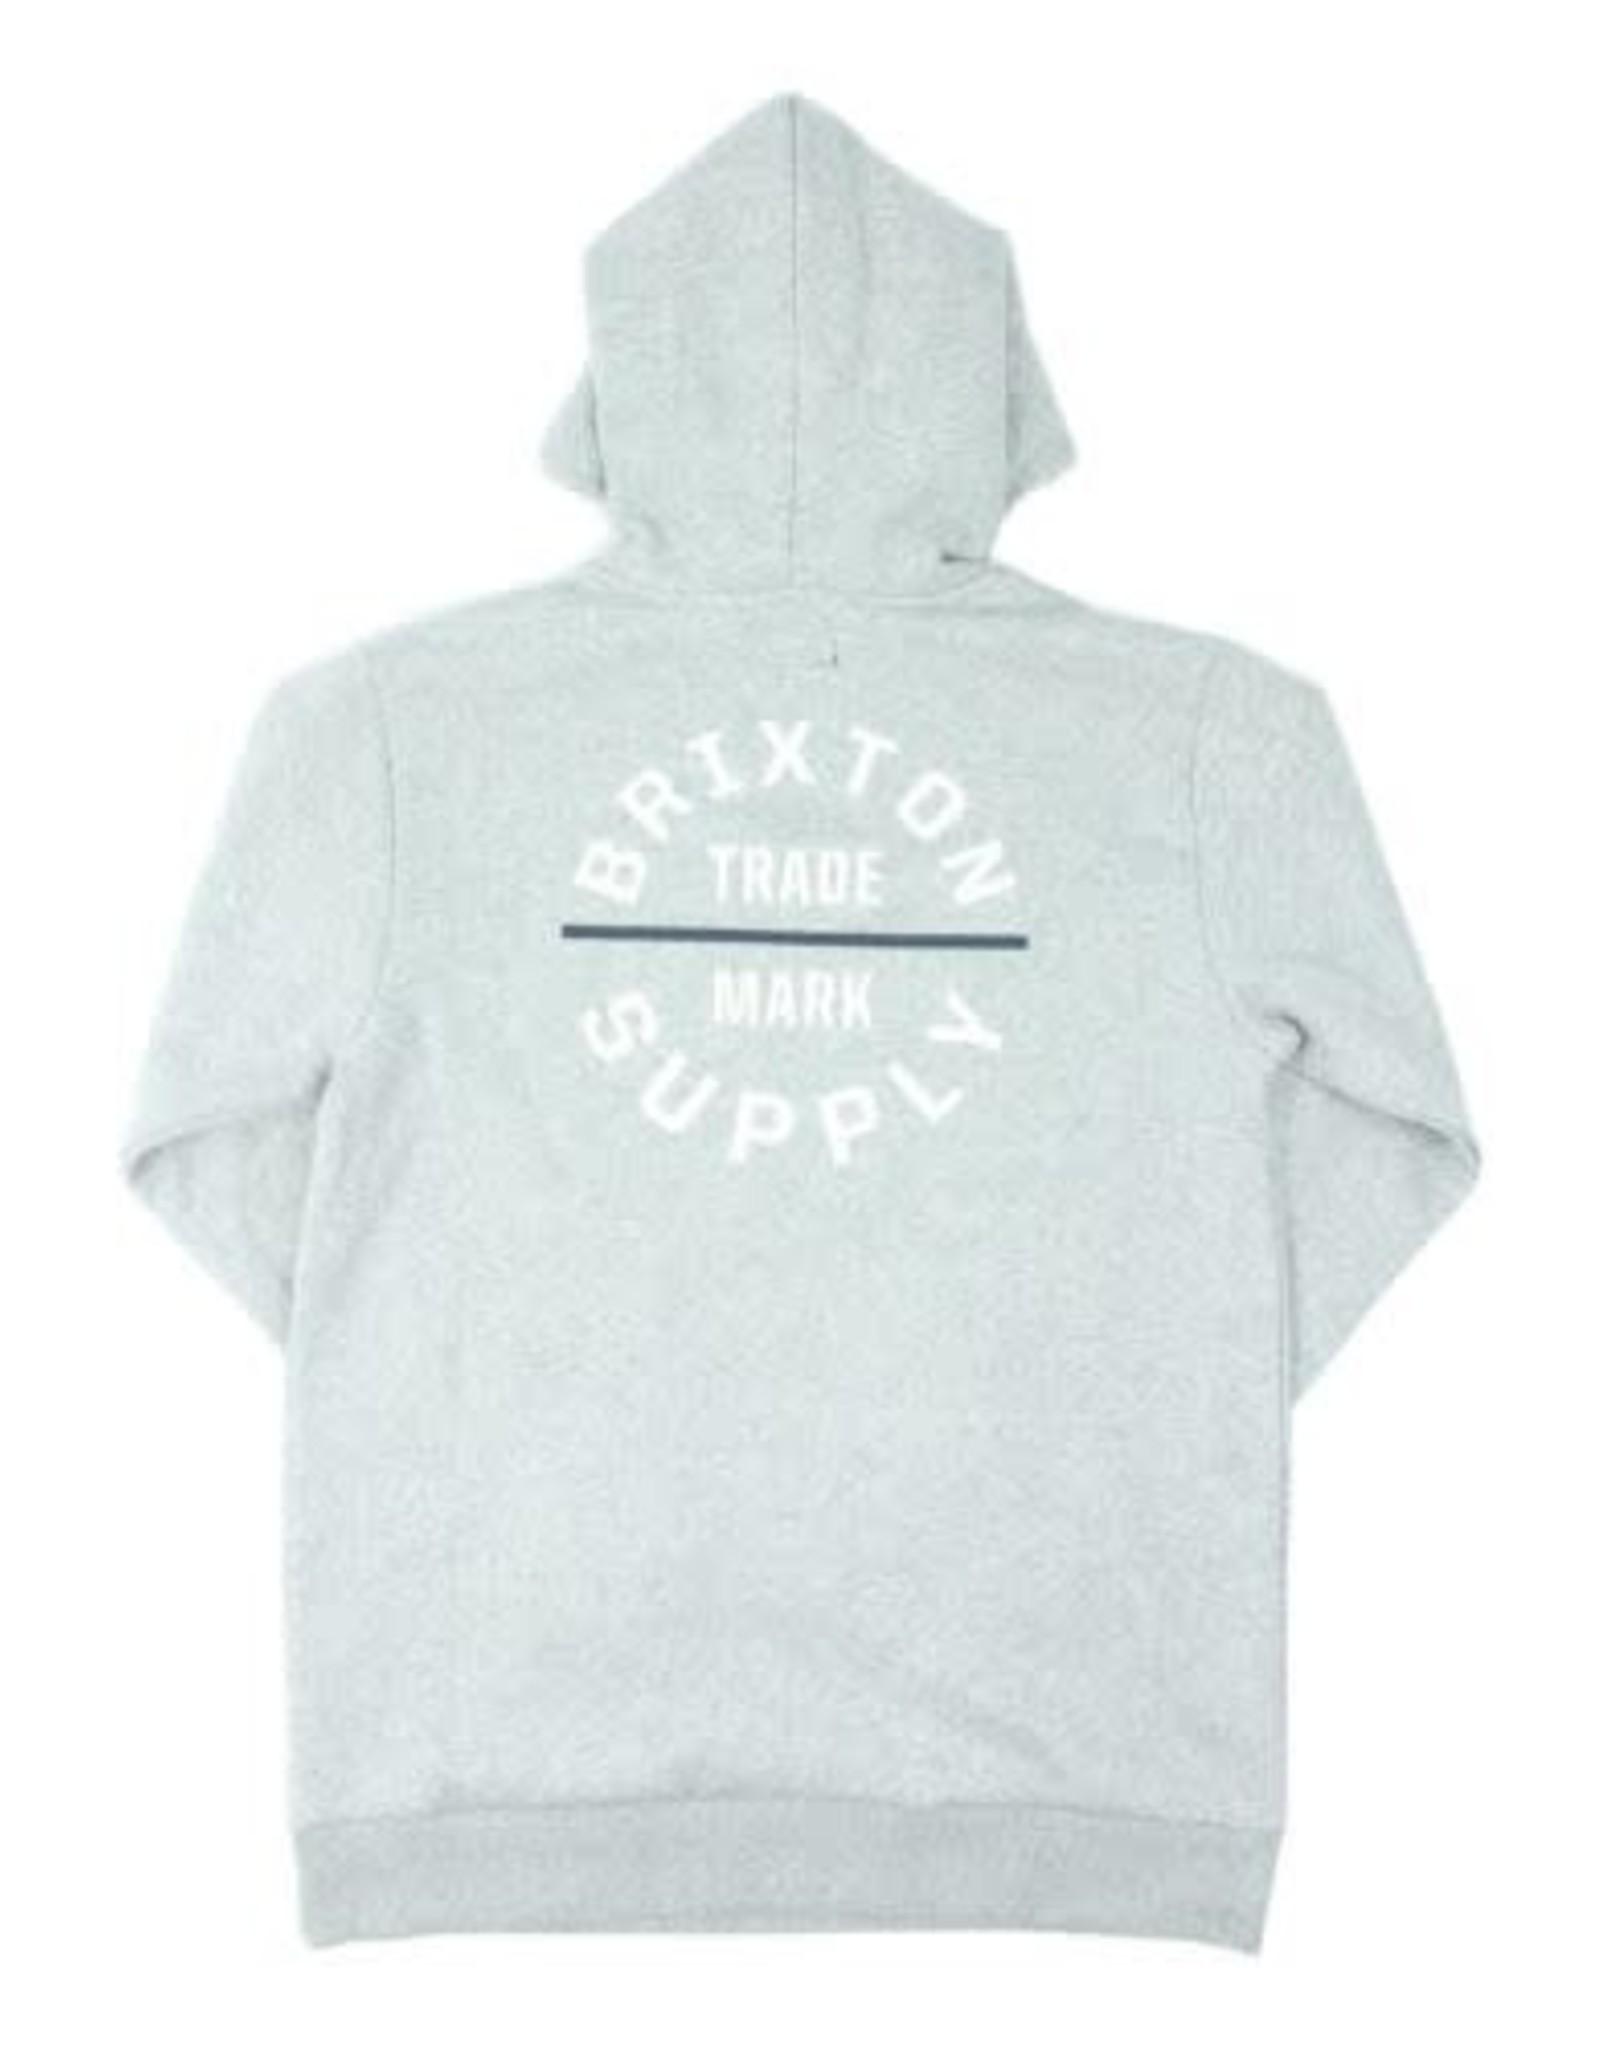 Brixton Brixton - Ouaté homme oath VI heather grey/white/washed navy